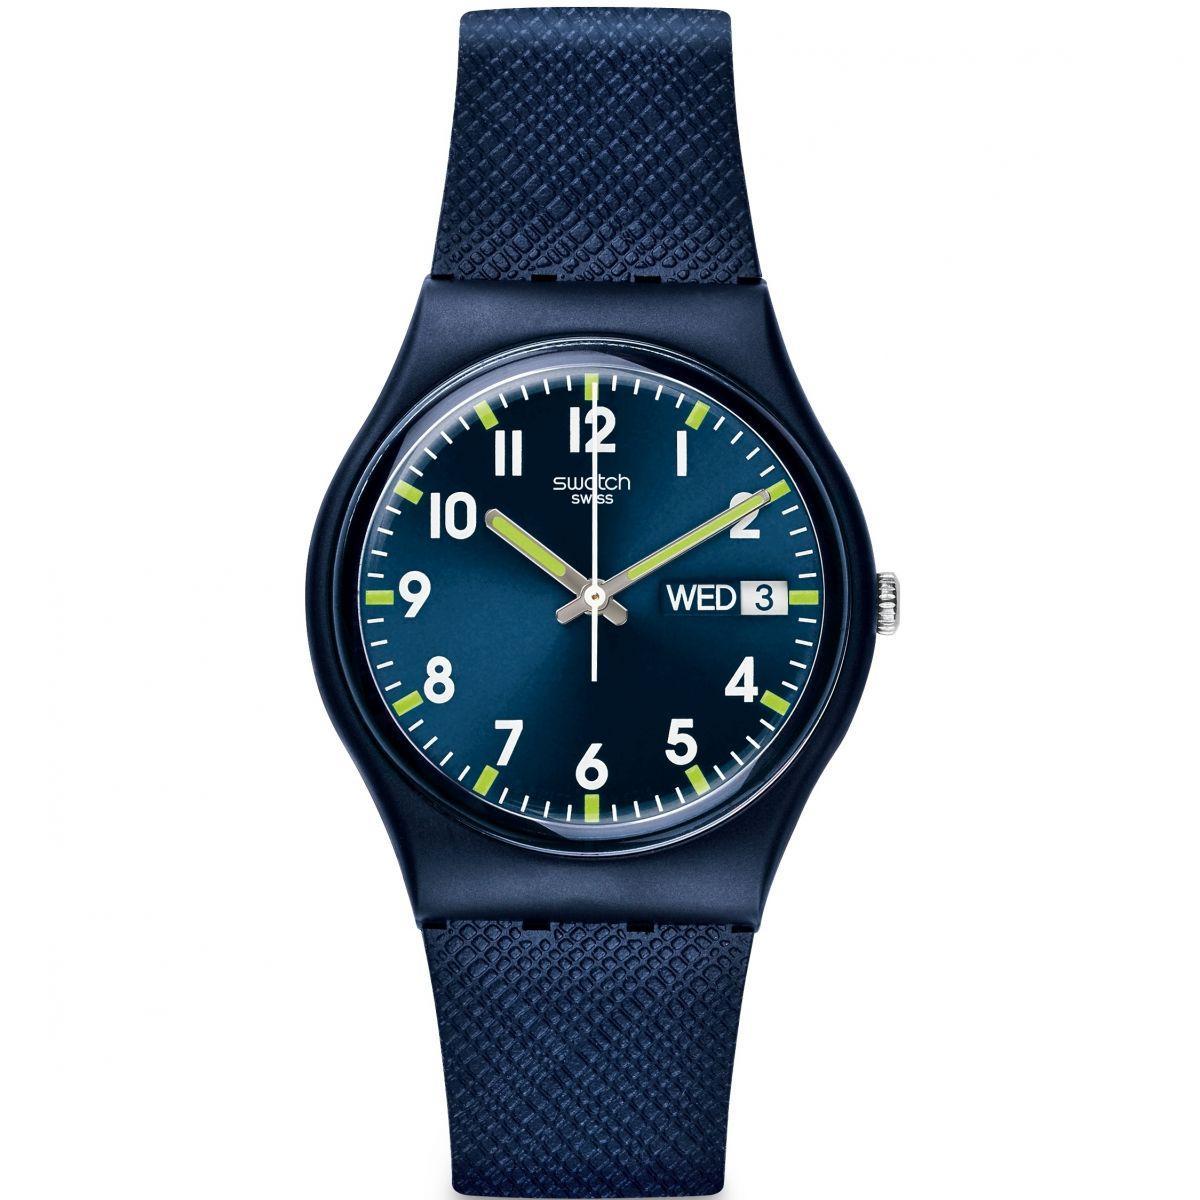 Swatch - Jam Tangan Wanita - Biru - Rubber Biru - GN718